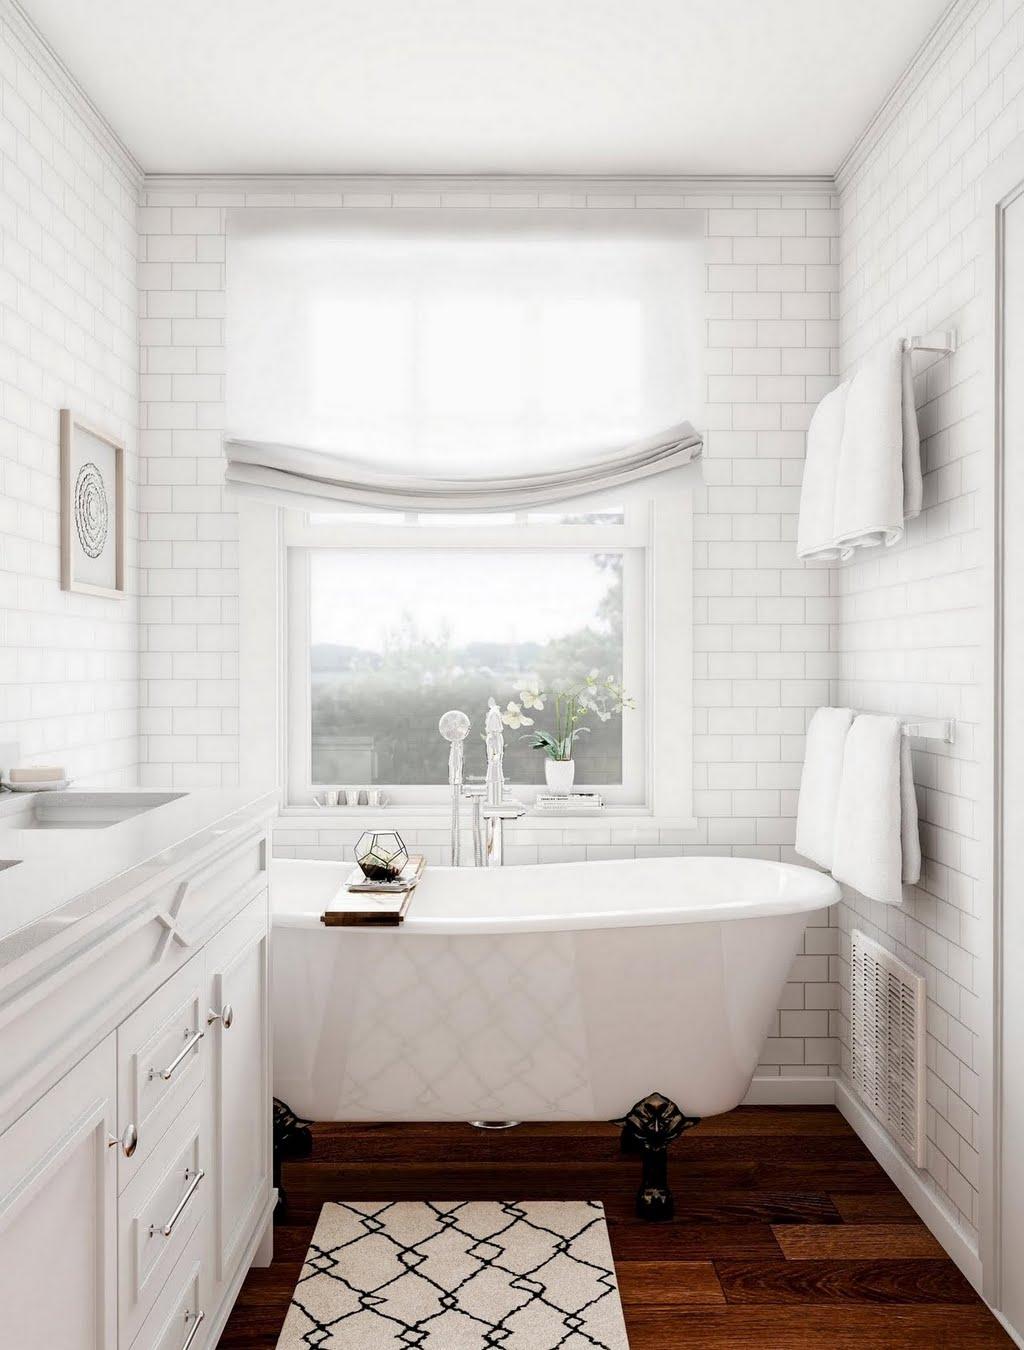 All-White Bathroom with Dark Floors – Bathroom – The Home Depot